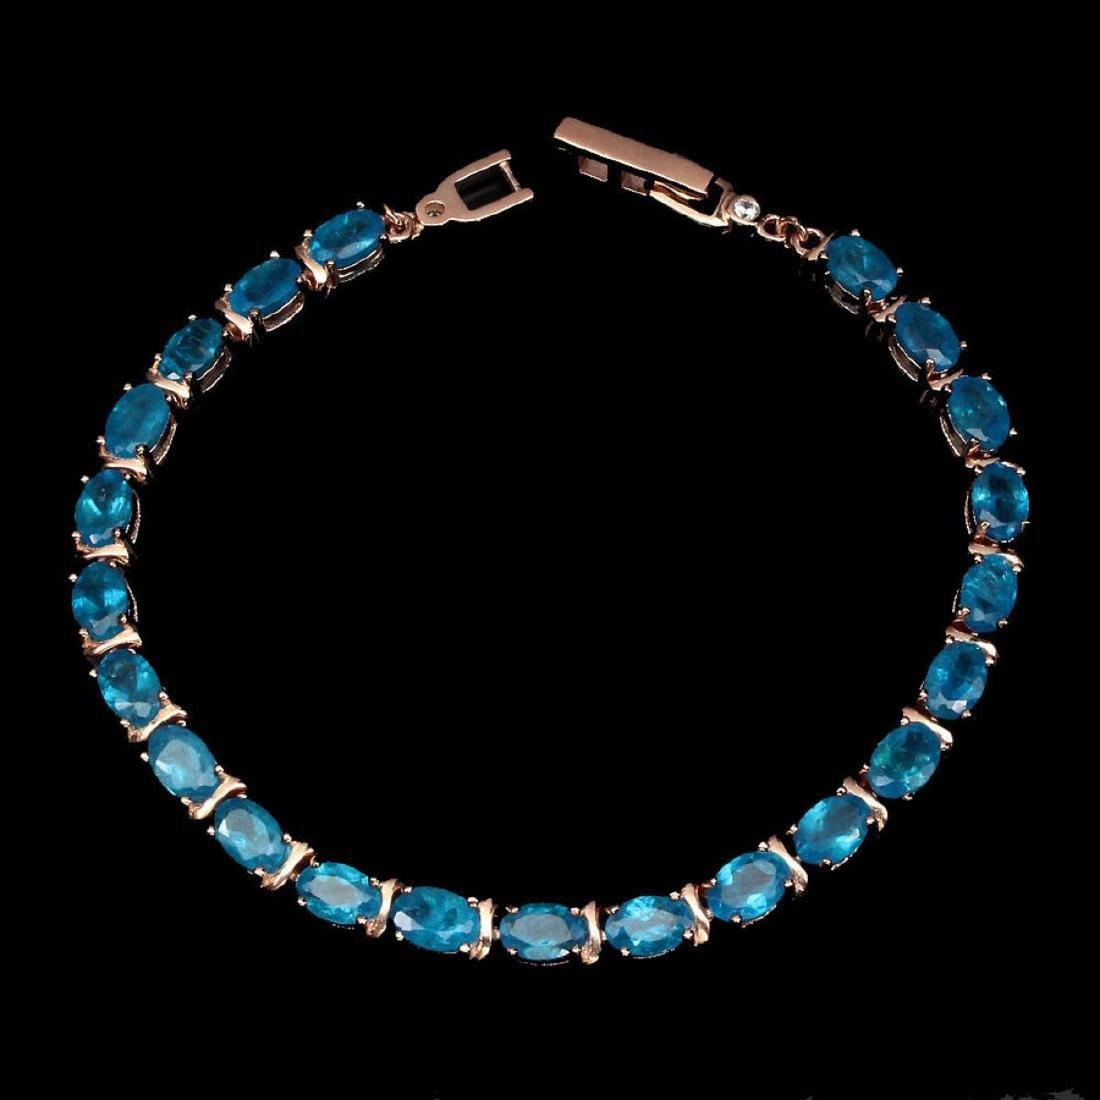 Natural Rare Brazil Neon Blue Apatite Bracelet - 2